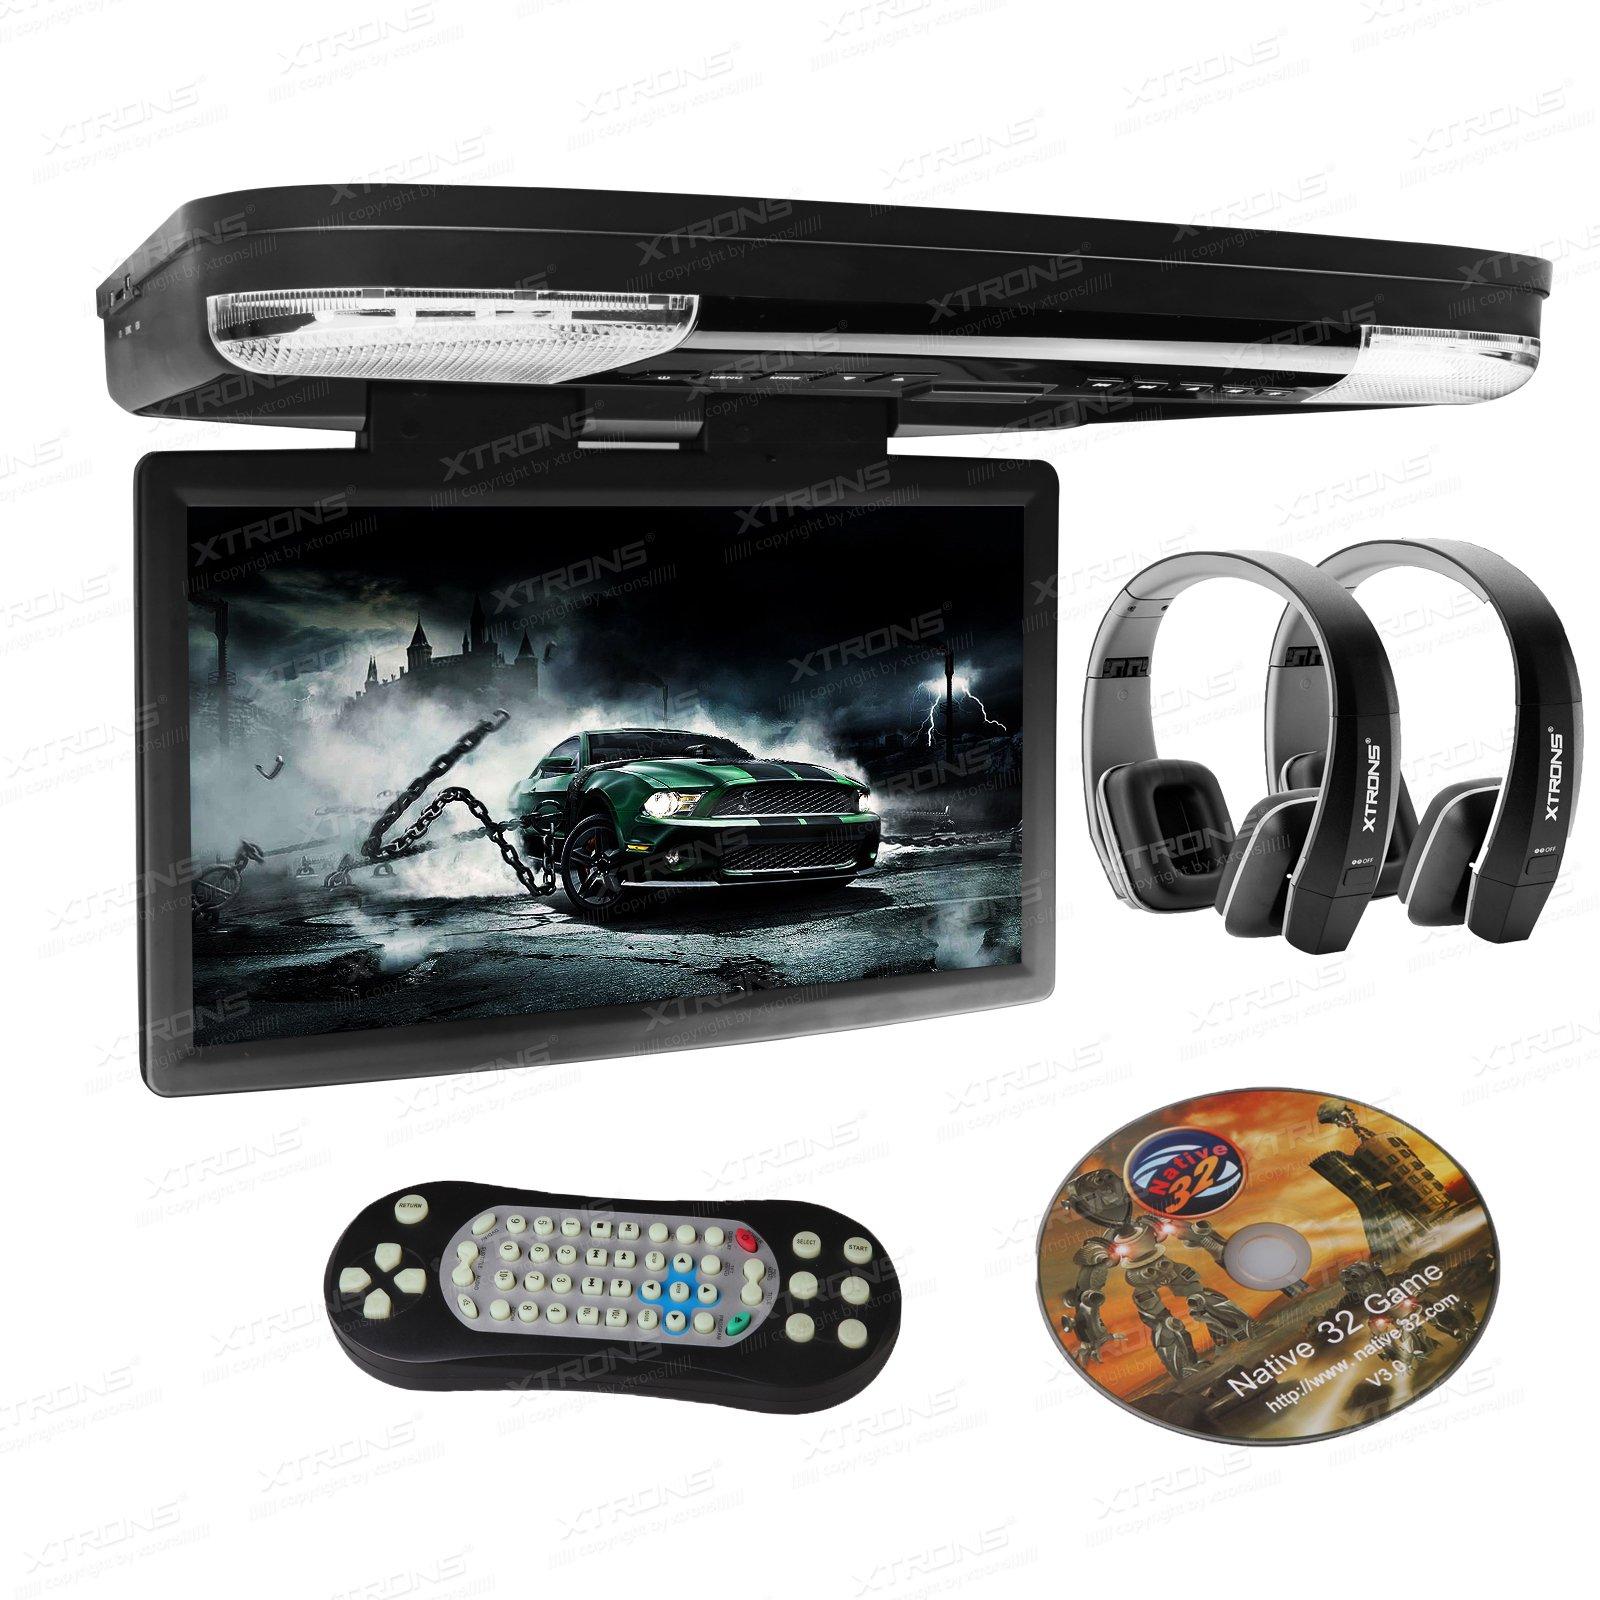 XTRONS 15.6 Inch 1080P Video HD Digital Widescreen Car Overhead Coach Caravan Roof Flip Down DVD Player Game Disc HDMI Port New Version Black IR Headphones Included by XTRONS